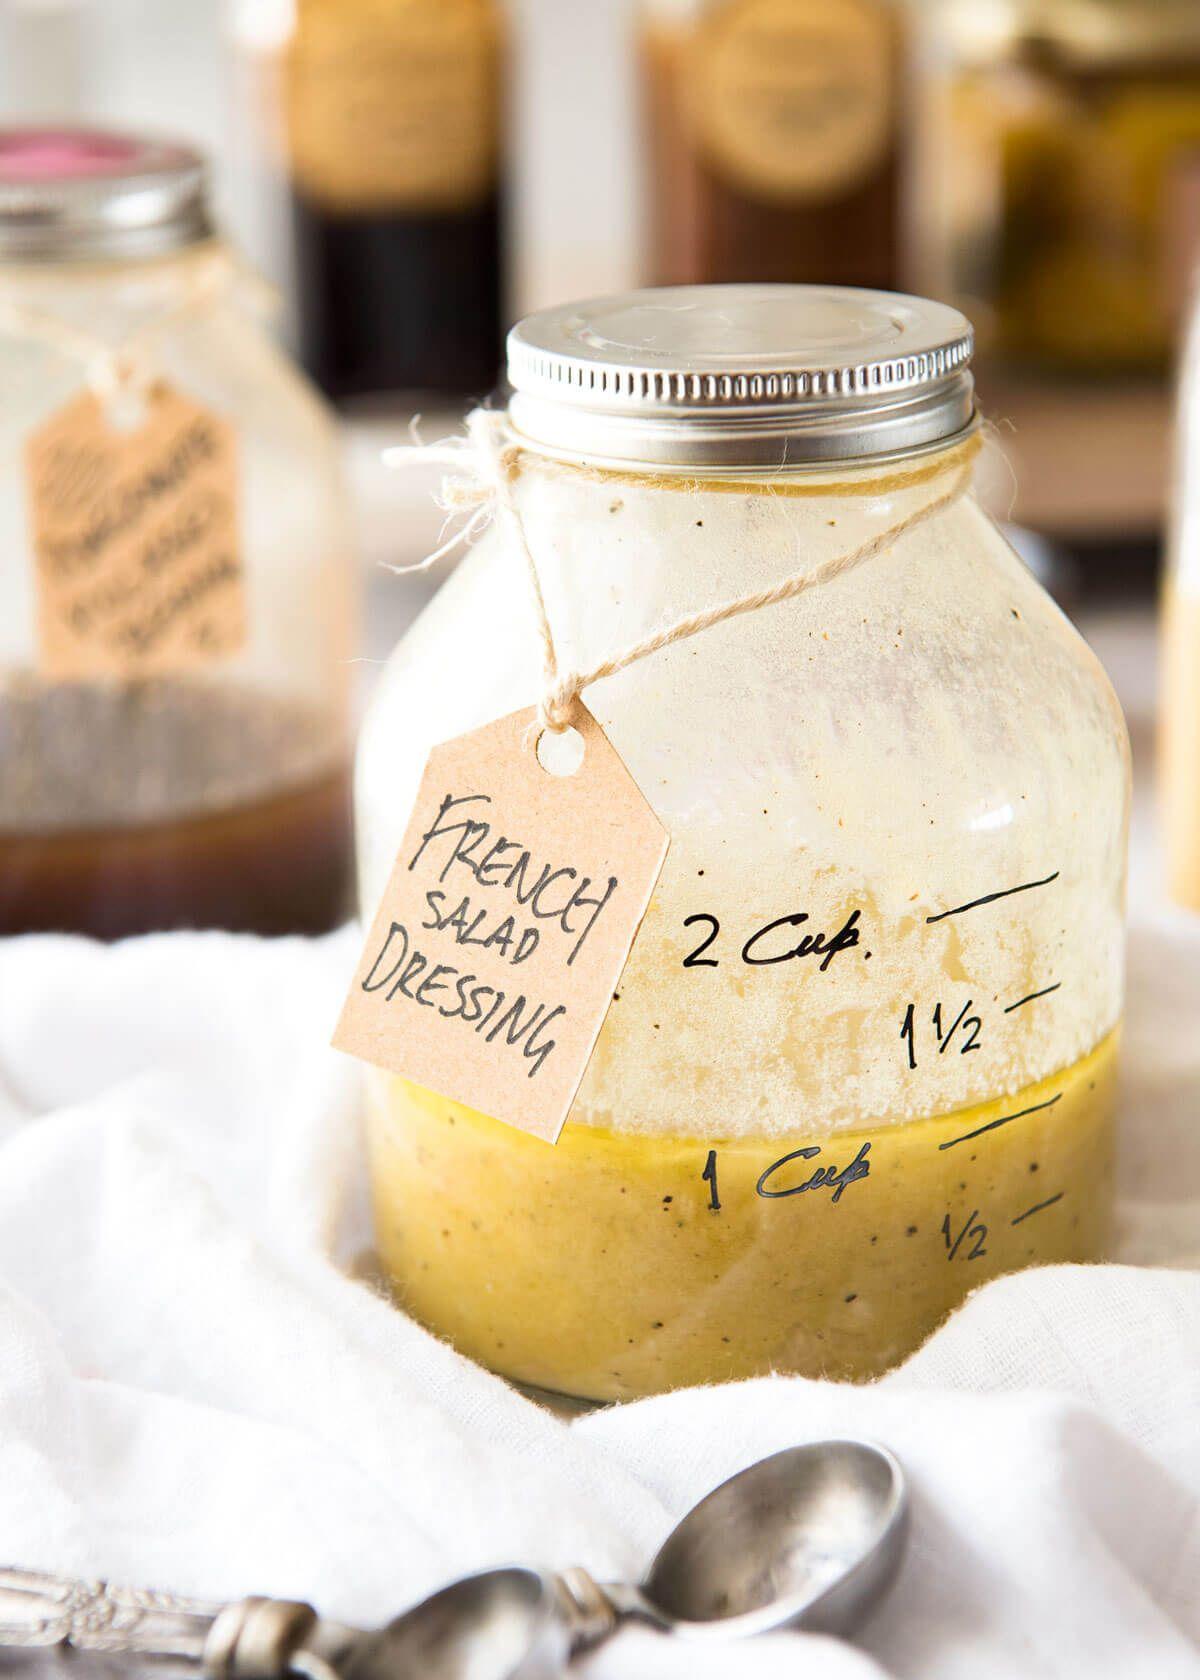 French Salad Dressing French Vinaigrette Recipe French Vinaigrette French Salad Dressings Vinaigrette [ 1680 x 1200 Pixel ]